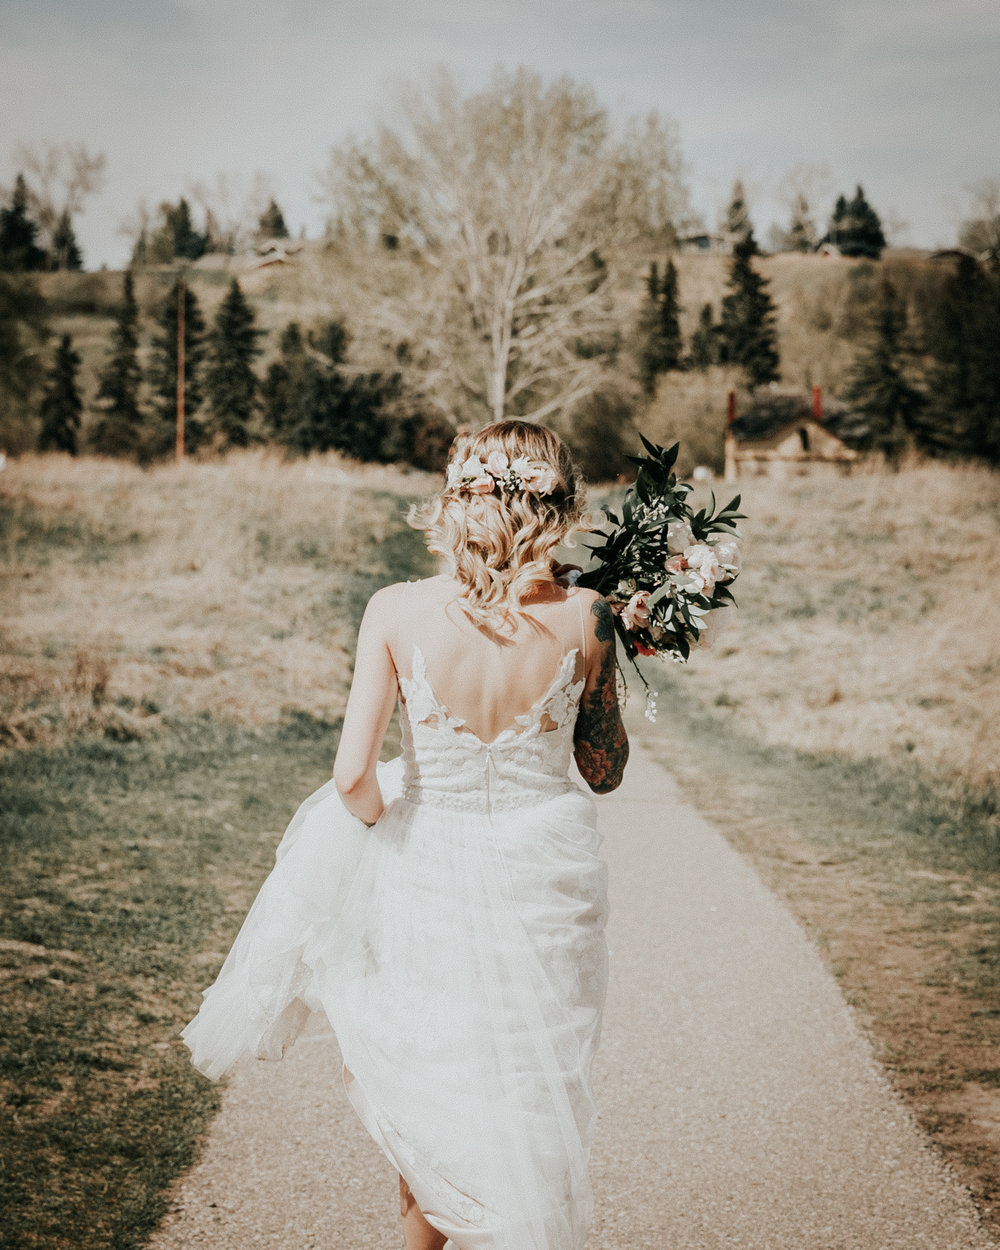 Walters Wedding Favourites - JayRMcDonald (16 of 18).JPG